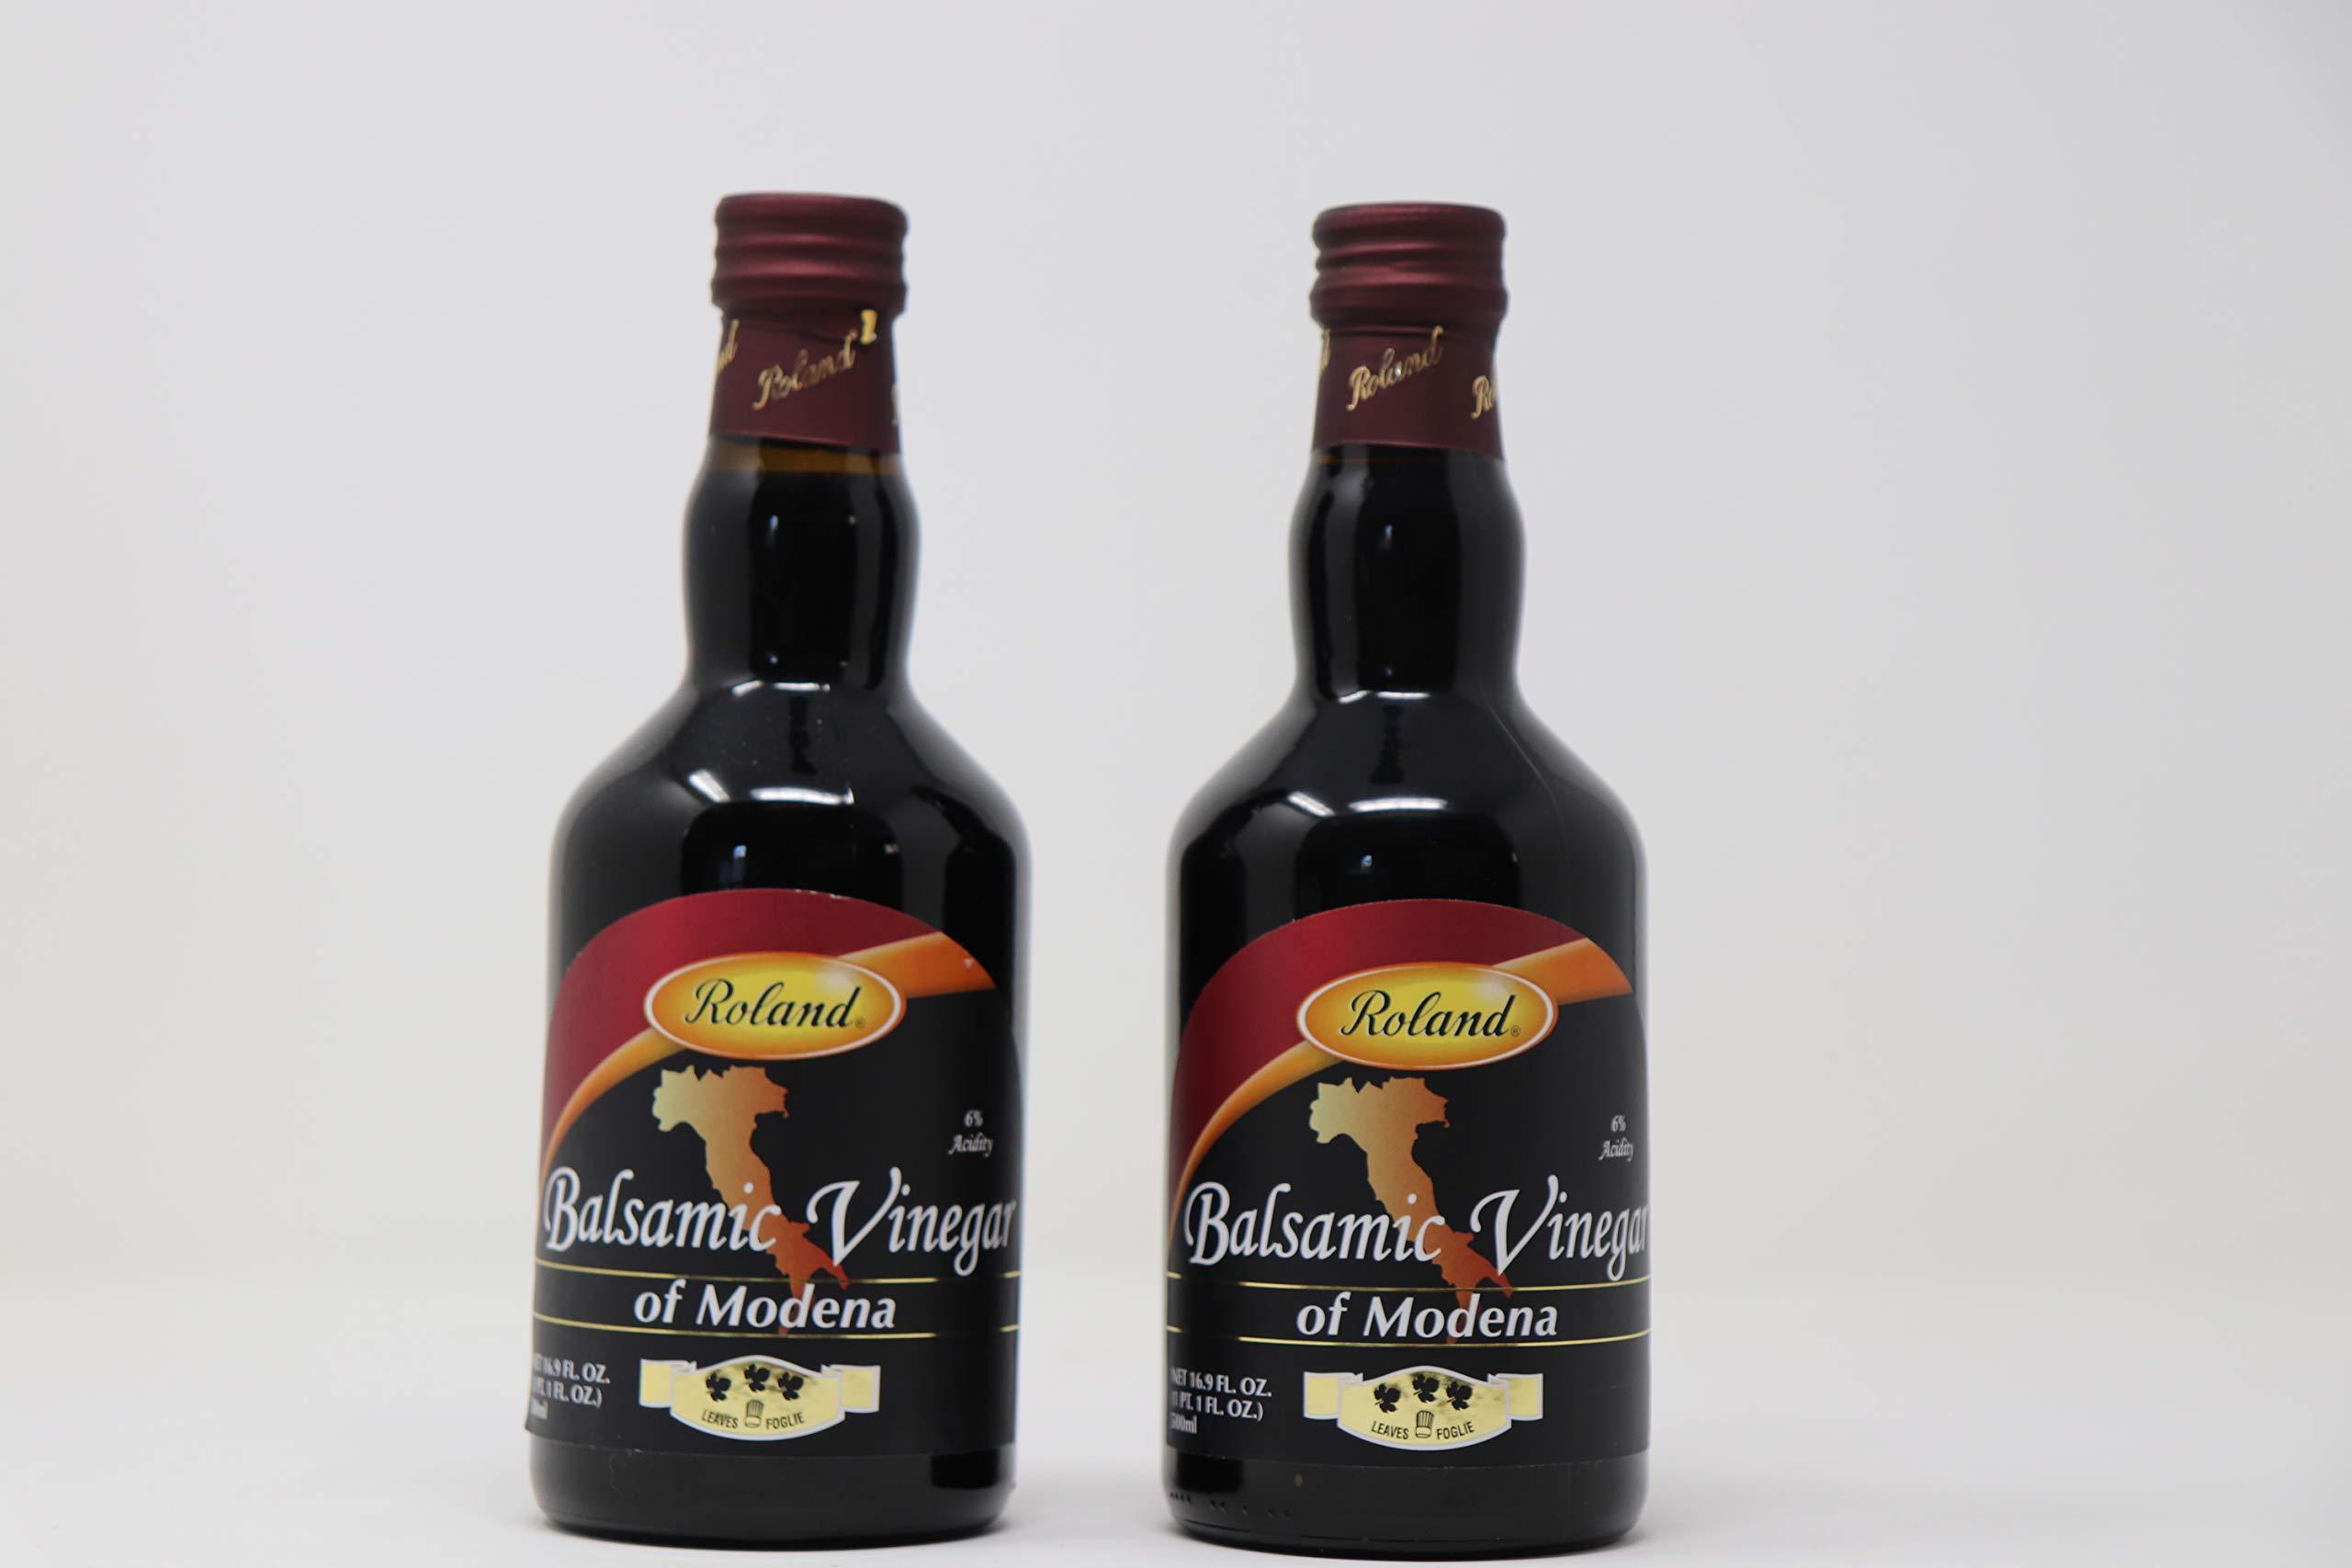 Roland Balsamic Vinegar, 33.8 FL OZ, 2 pack by RD